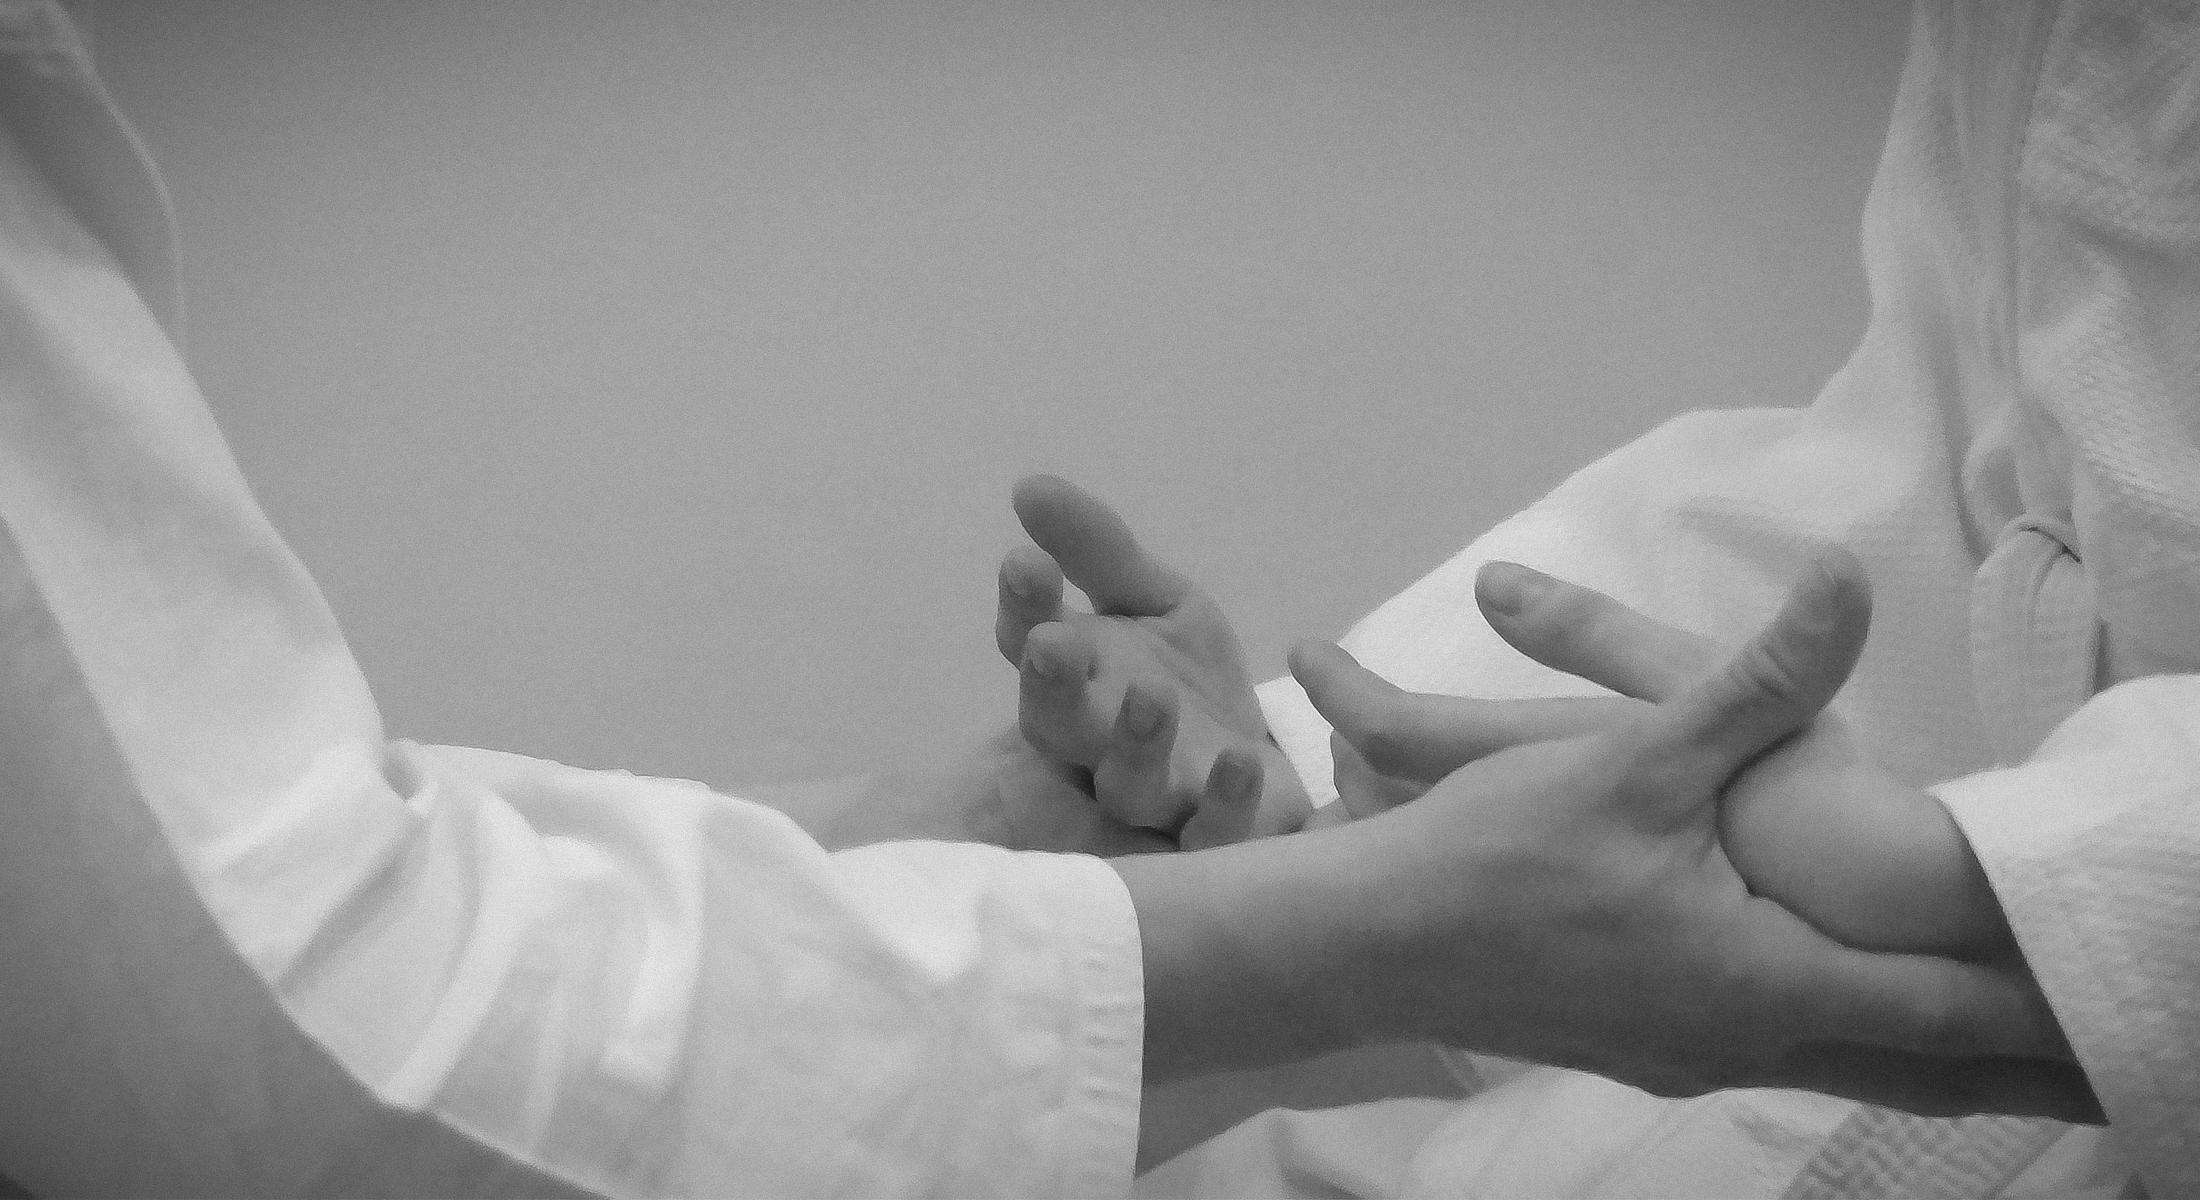 http://www.aikido-schule-bielefeld.de/wp-content/uploads/2018/07/slider01.jpg